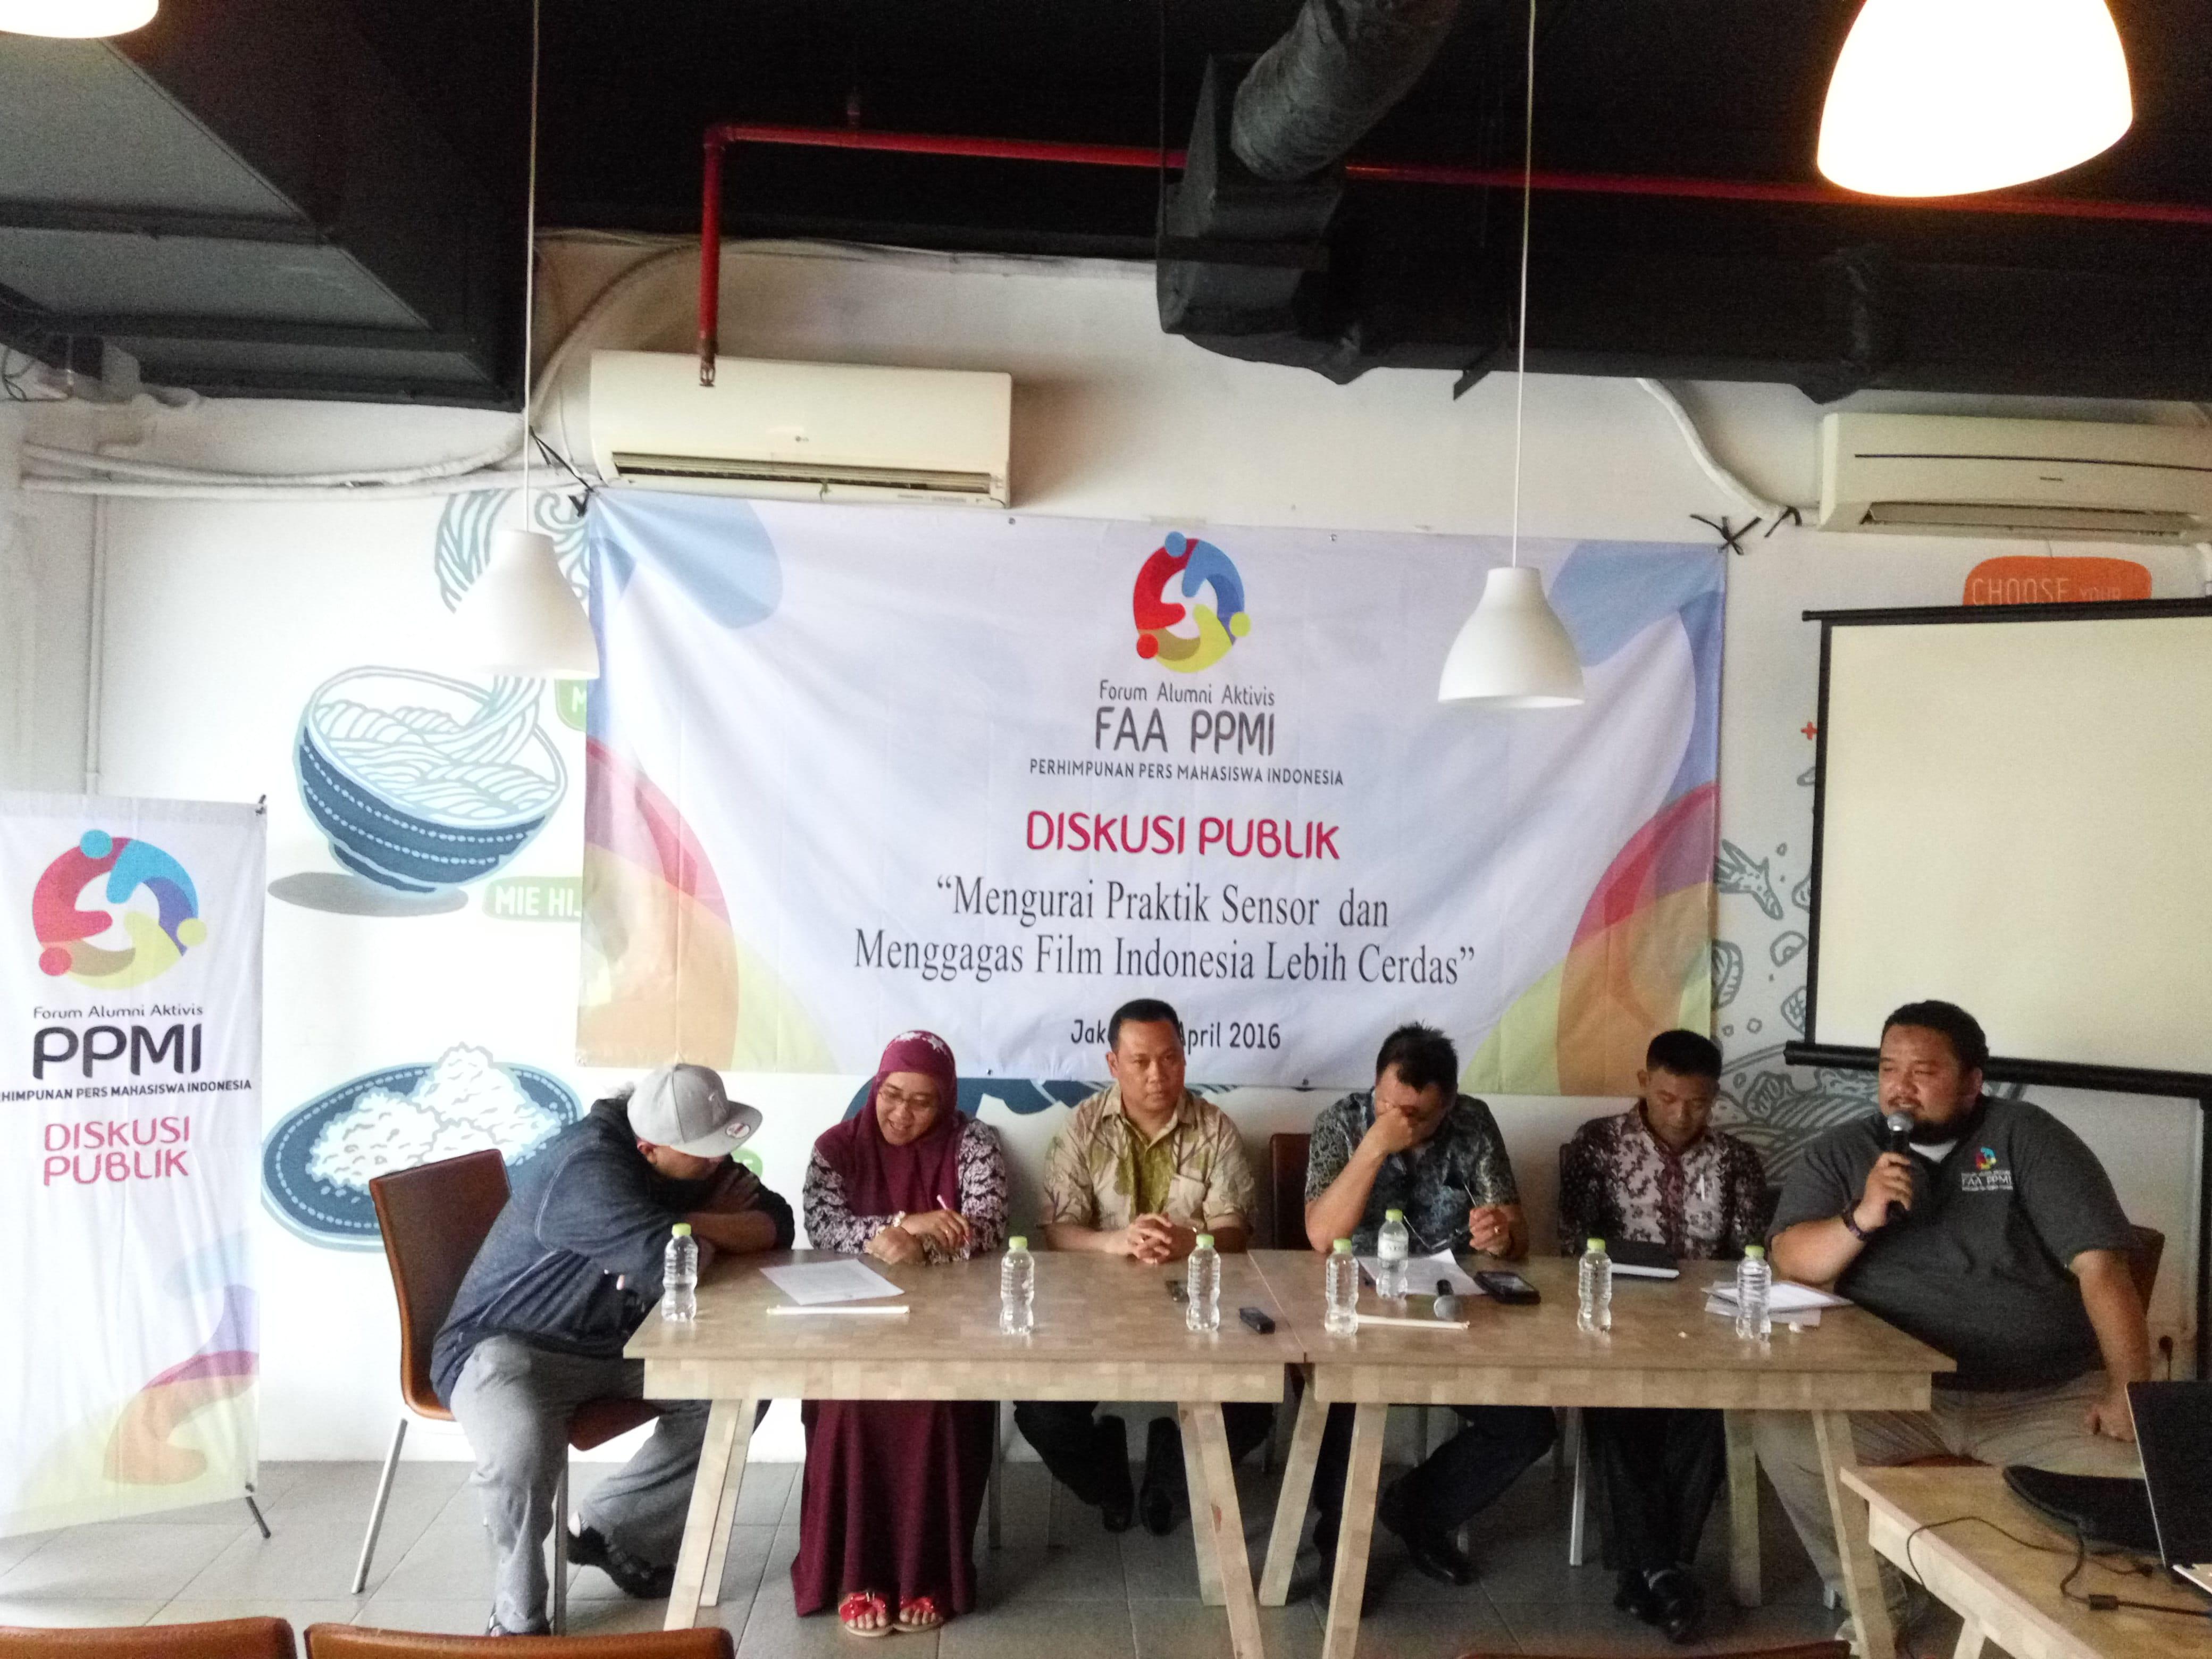 Acara diskusi FAA PPMI, Minggu, 3 April 2016. (Kiri ke kanan) Anggi Umbara Film Maker (Sutradara Comic 8), Maria Advianti ( Komisioner Komisi Perlindungan Anak Indonesia/ KPAI), Rommy Fibri (Komisioner Lembaga Sensor Film/LSF), Ody Mulya Hidyat (Produser Film Maxima International), Khalid Fathoni (Kepala Bidang Pusat Pengembangan Film Kementrian Pendidikan dan Kebudayaan), dan Andika Wardana